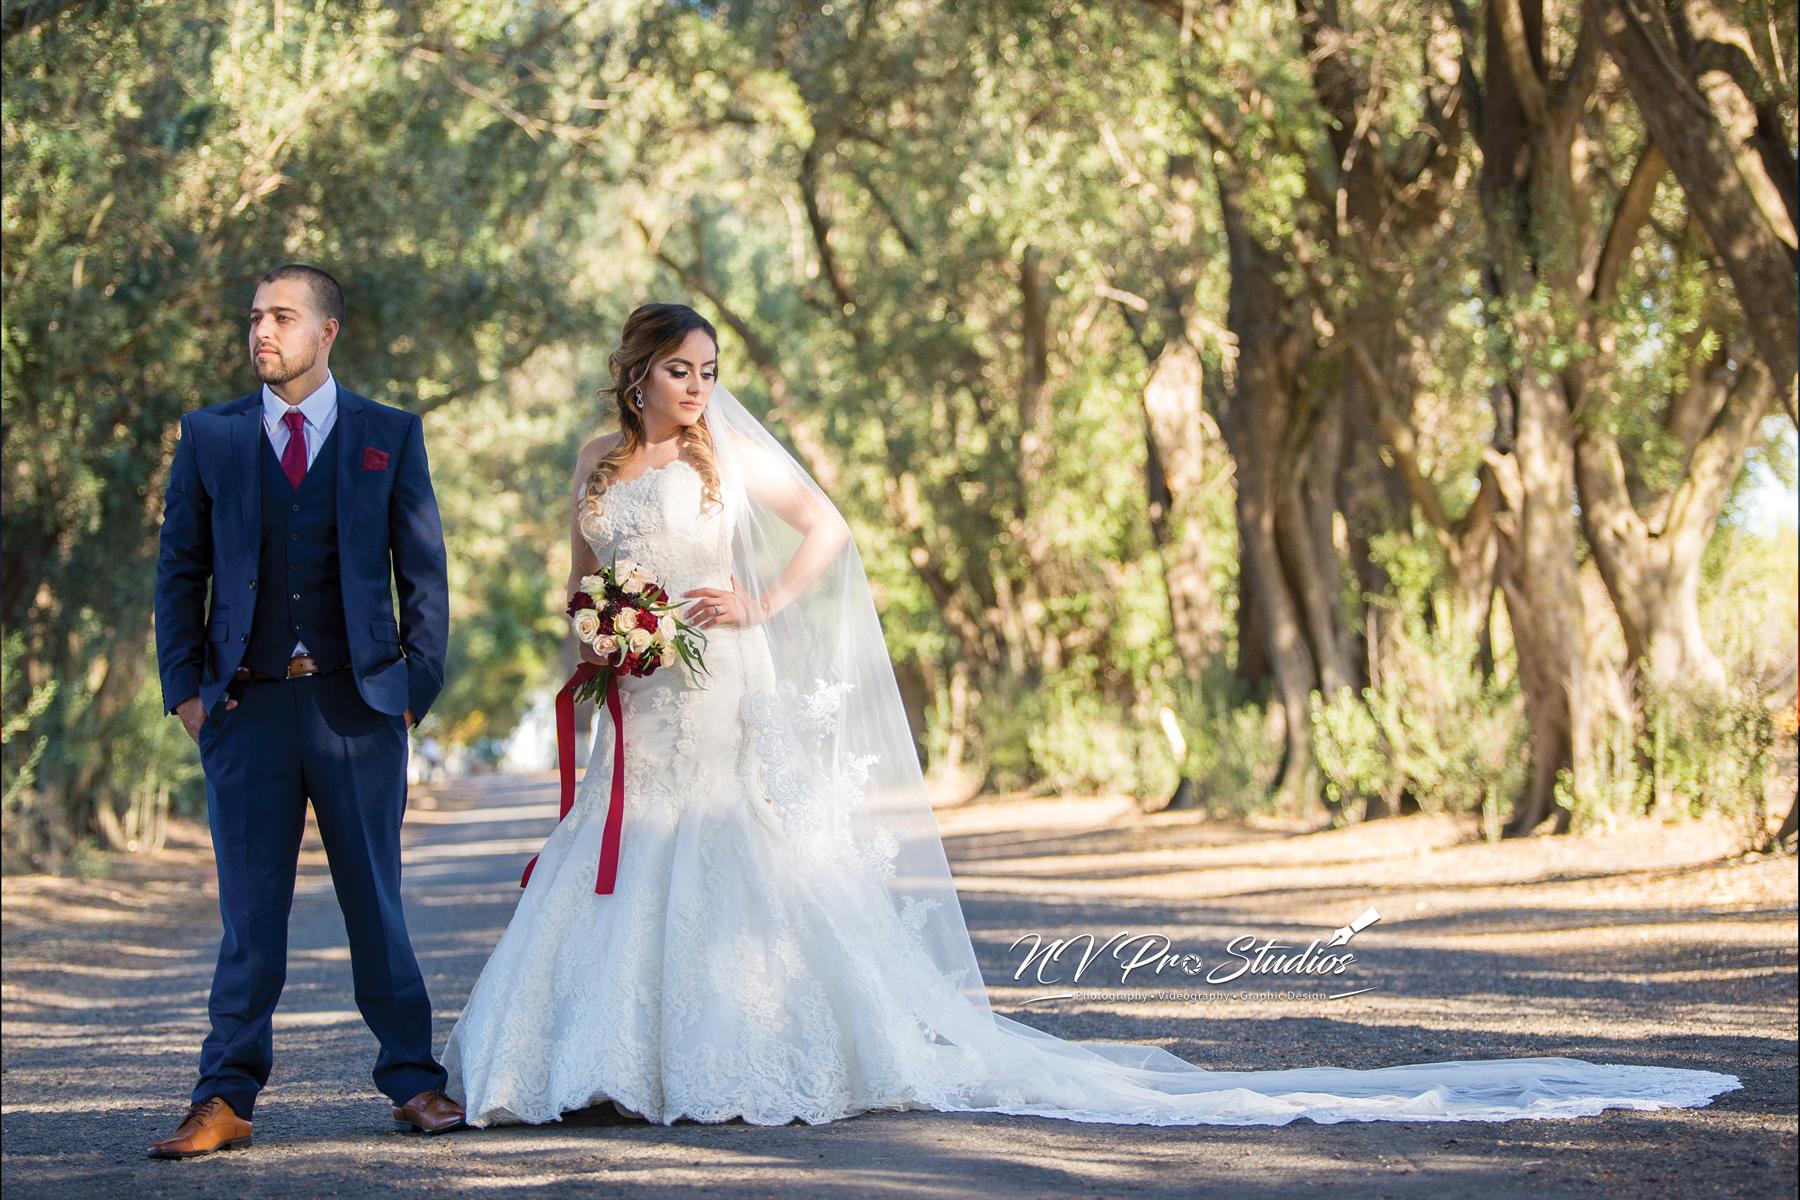 Carson City Photography | Wedding Photographer